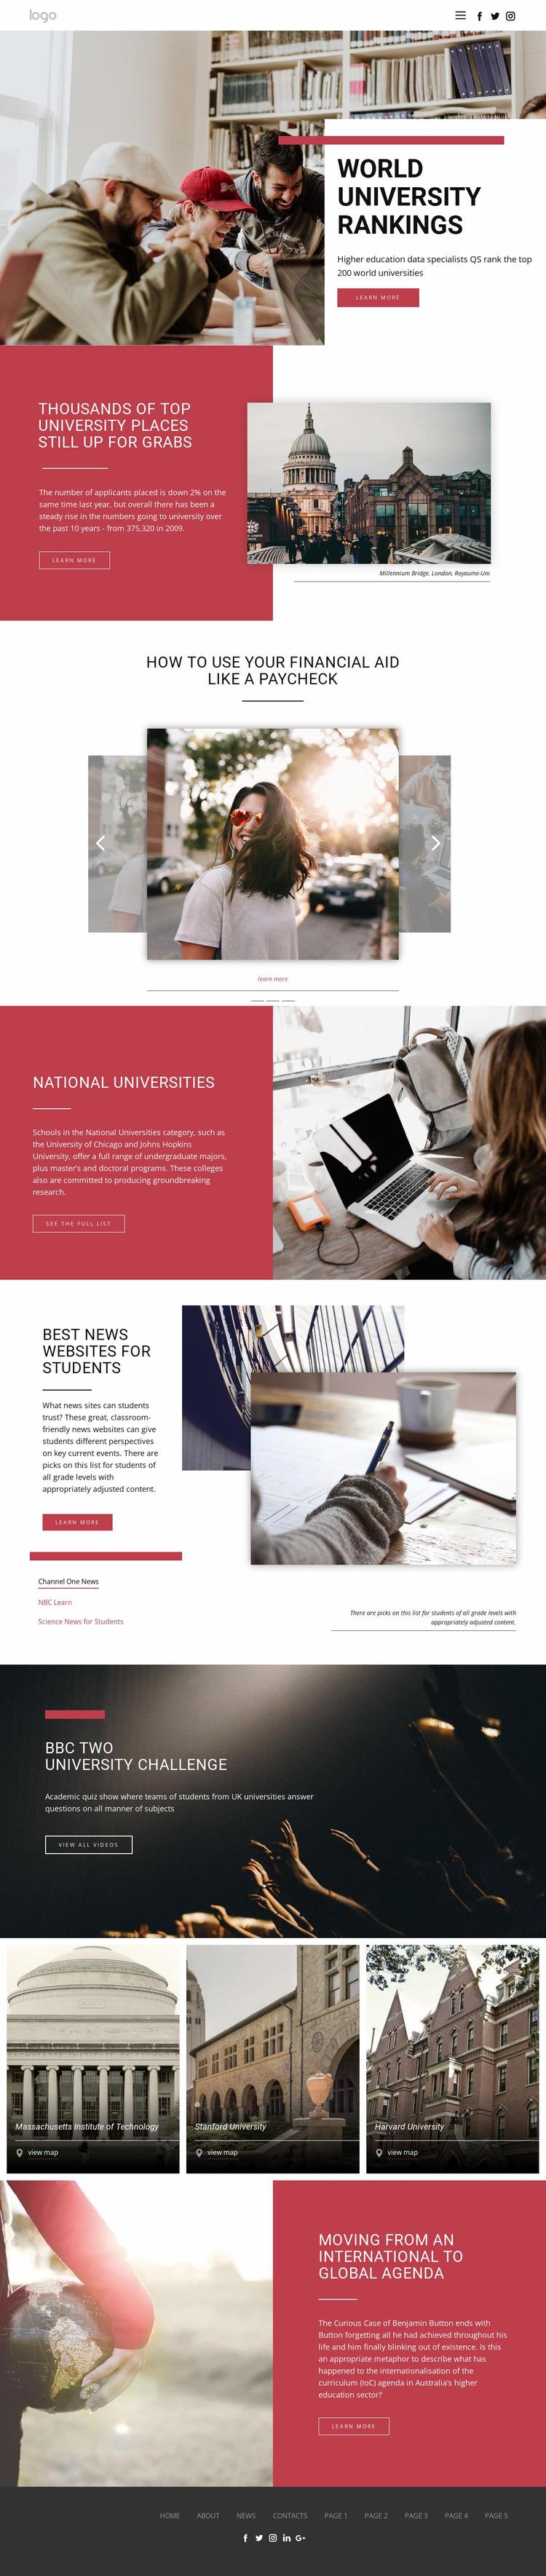 Ranking university education Website Builder Templates